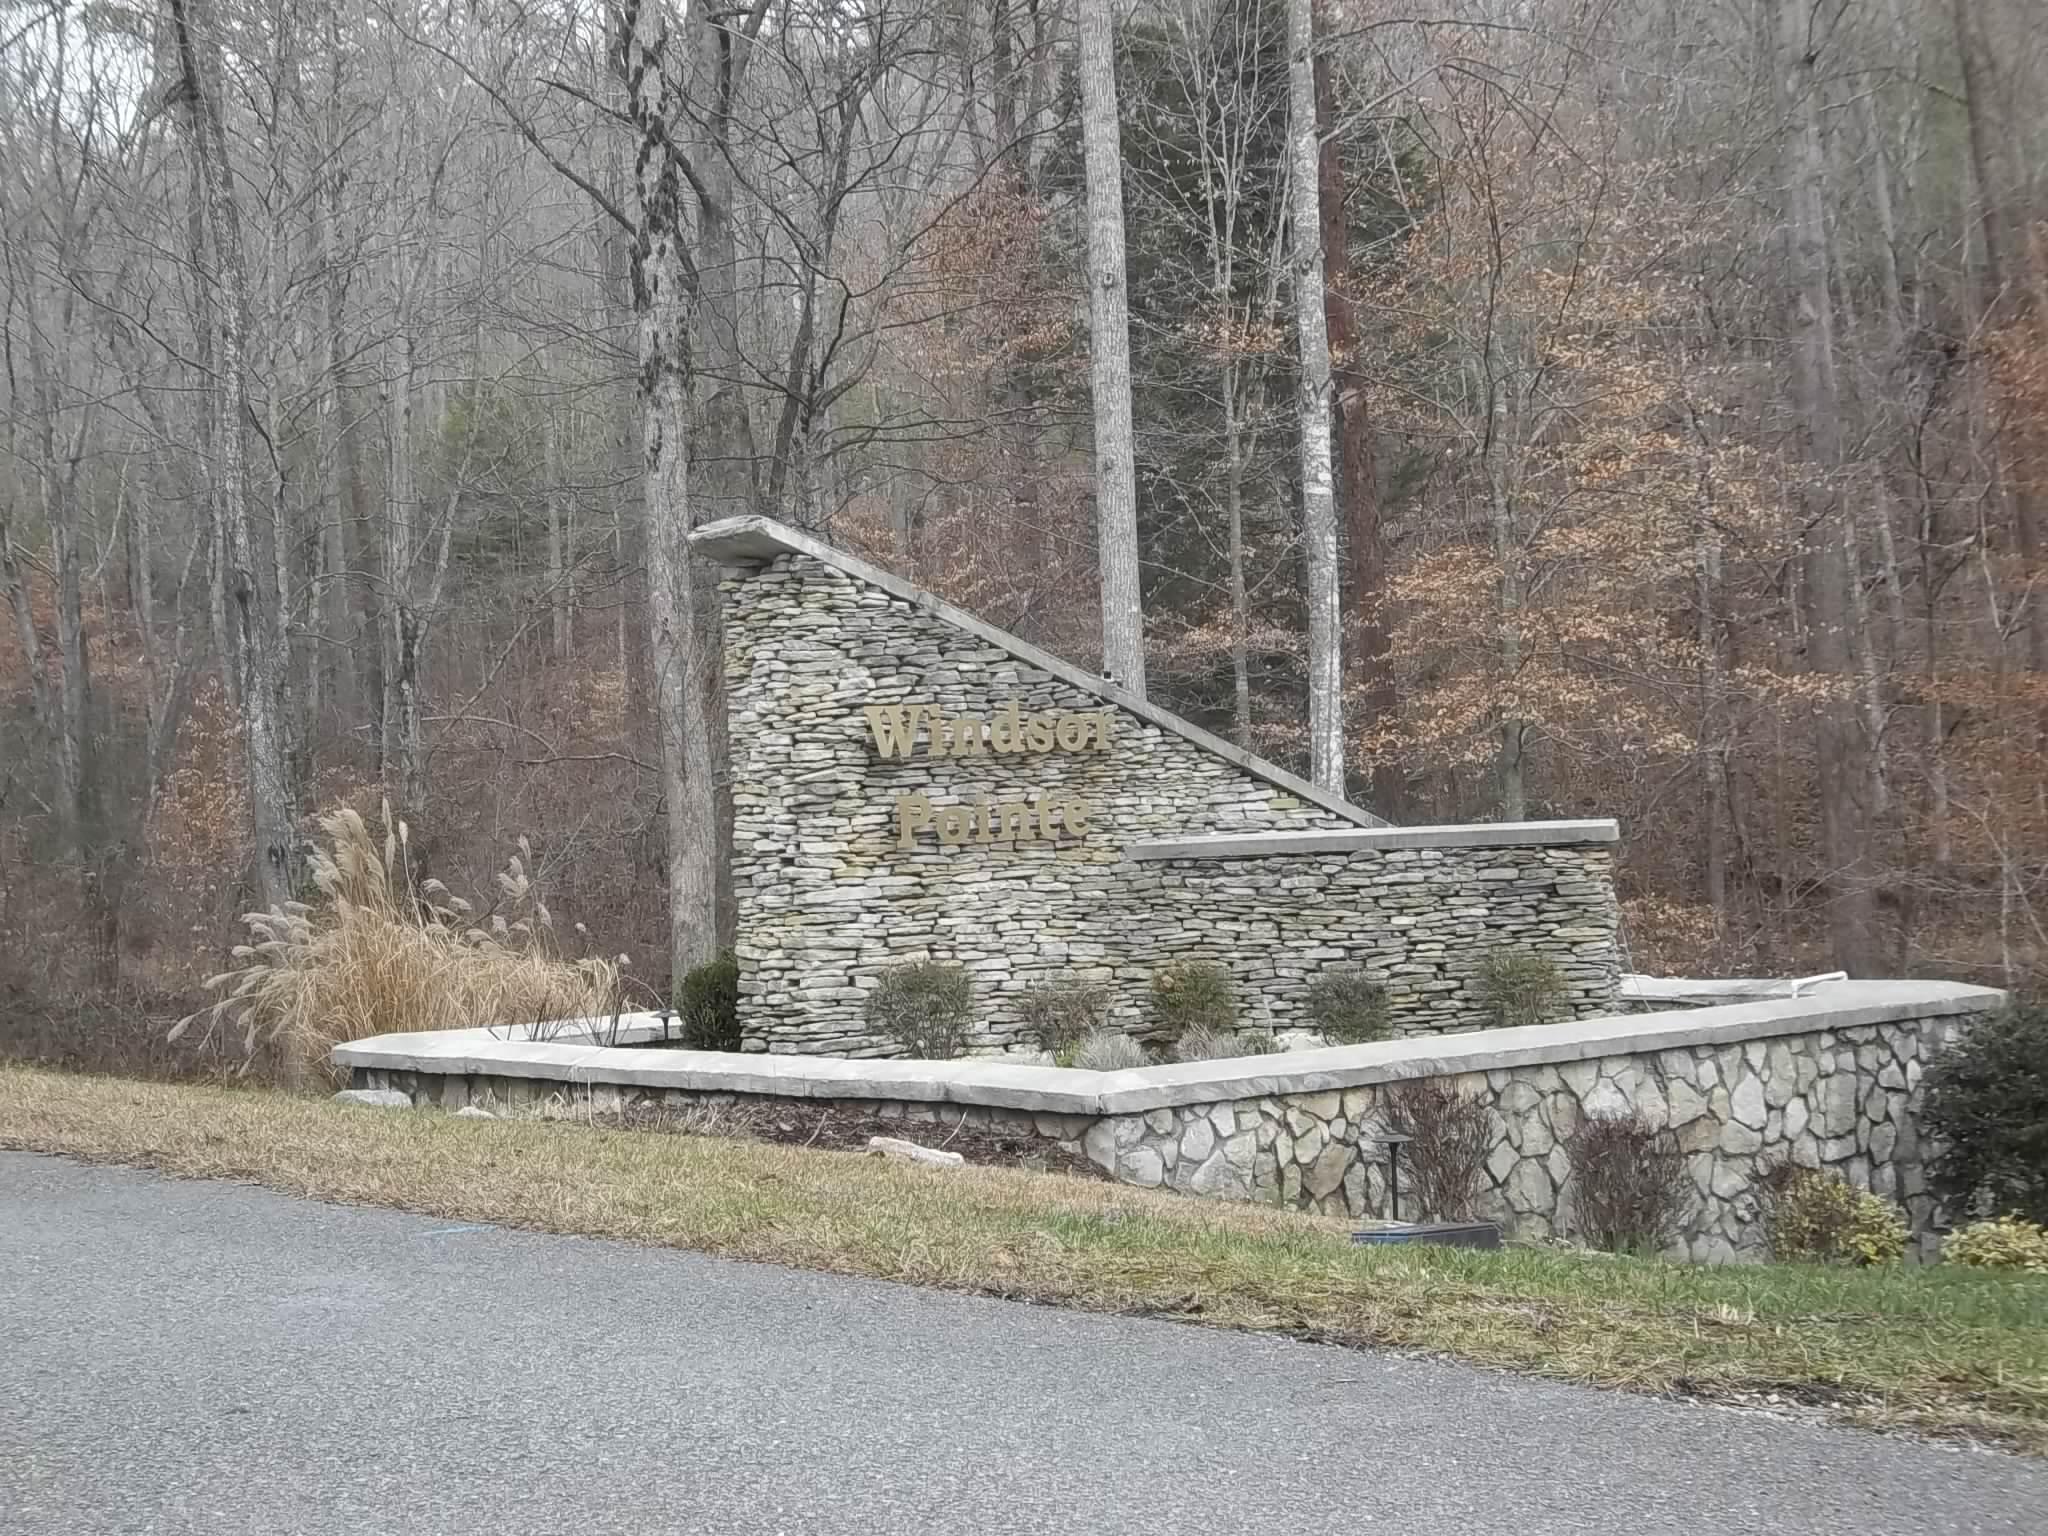 Stoney Rock Lane: